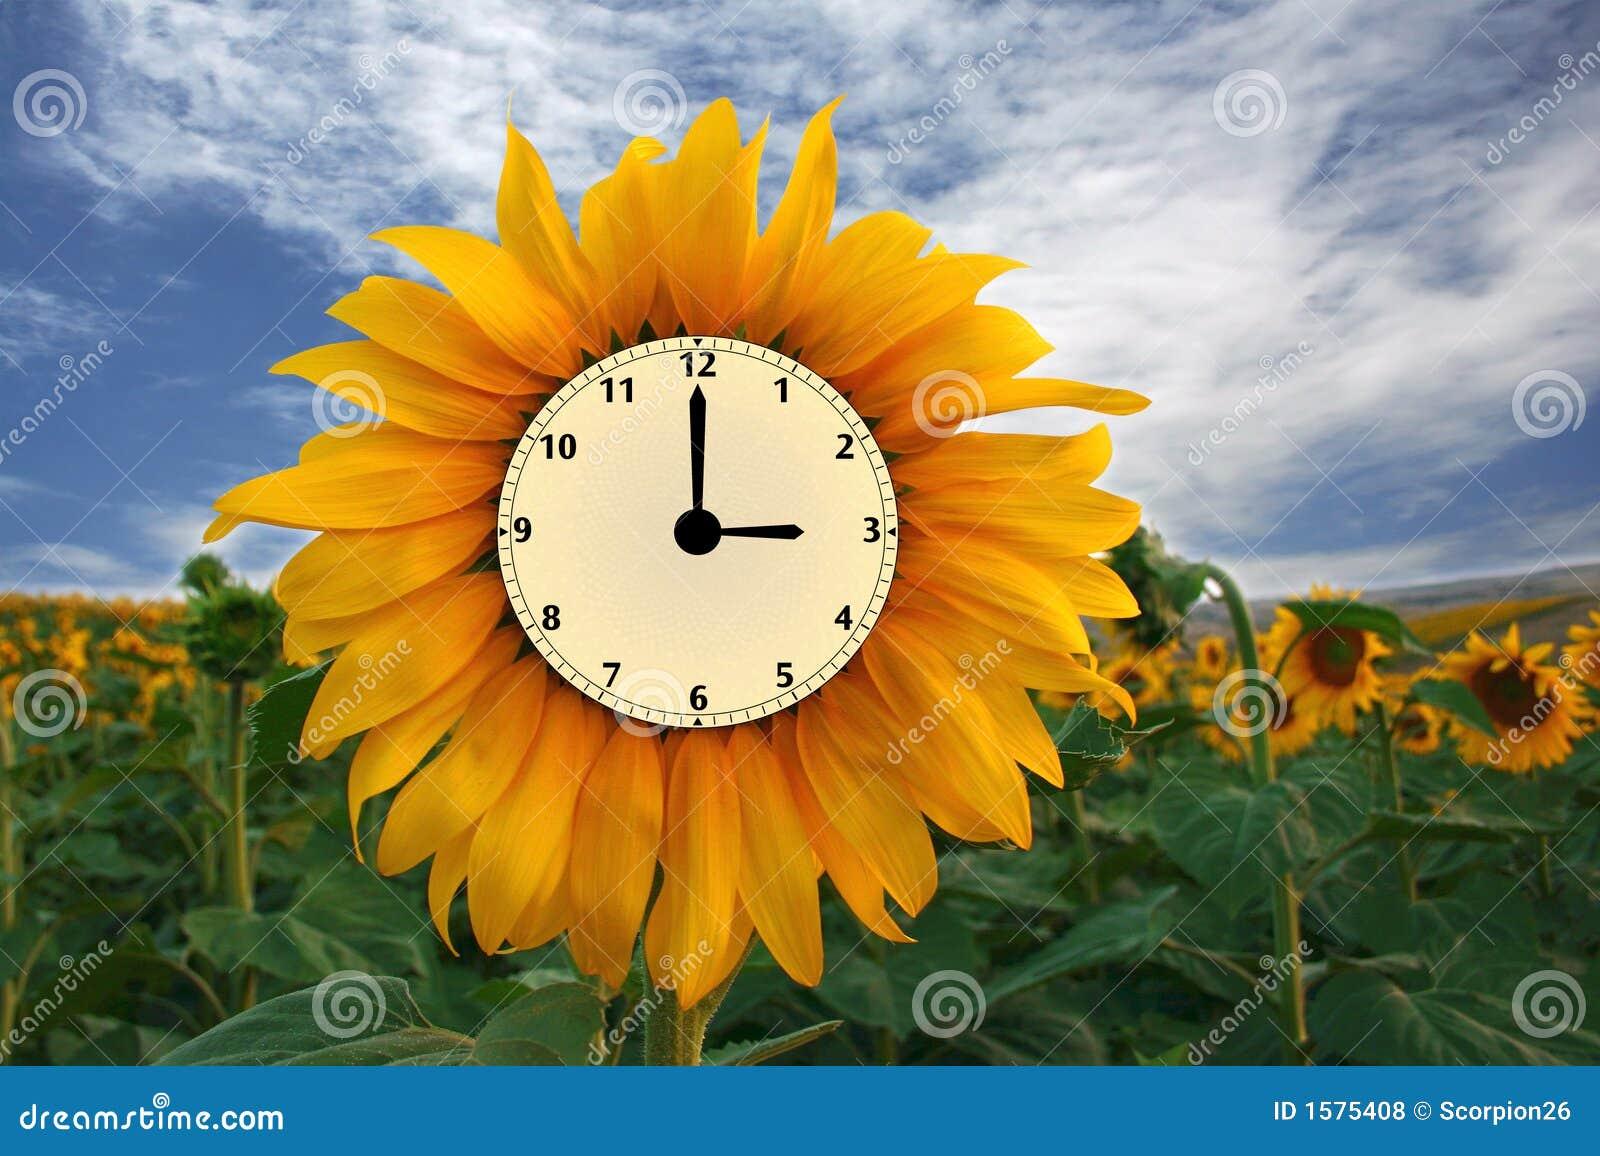 sunflower clock royalty free stock photos image 1575408. Black Bedroom Furniture Sets. Home Design Ideas